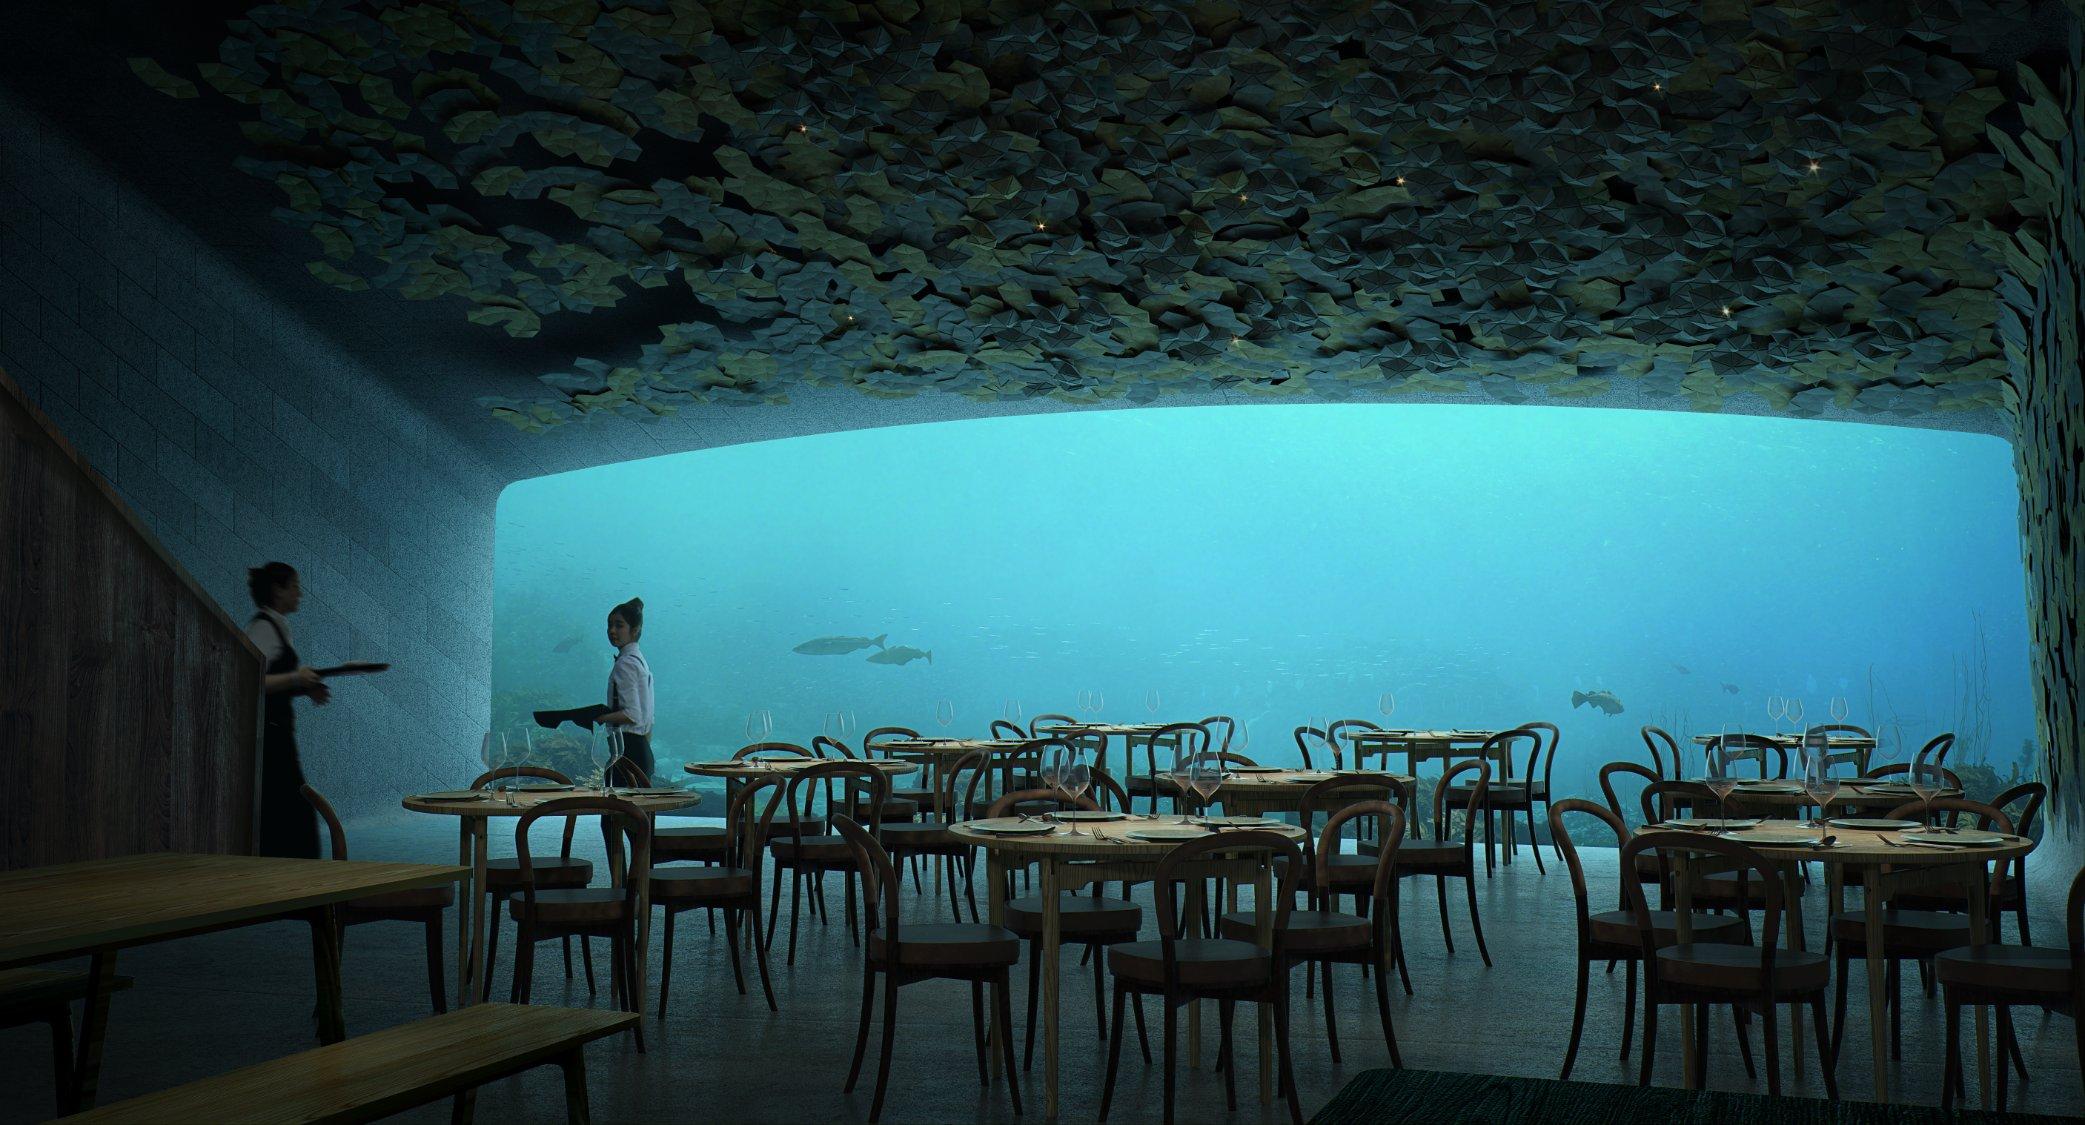 underwater restaurant Norwegian Architecture Firm Reveals Project for First Underwater Restaurant 3 Norwegian Architecture Firm Reveals Project for First Underwater Restaurant